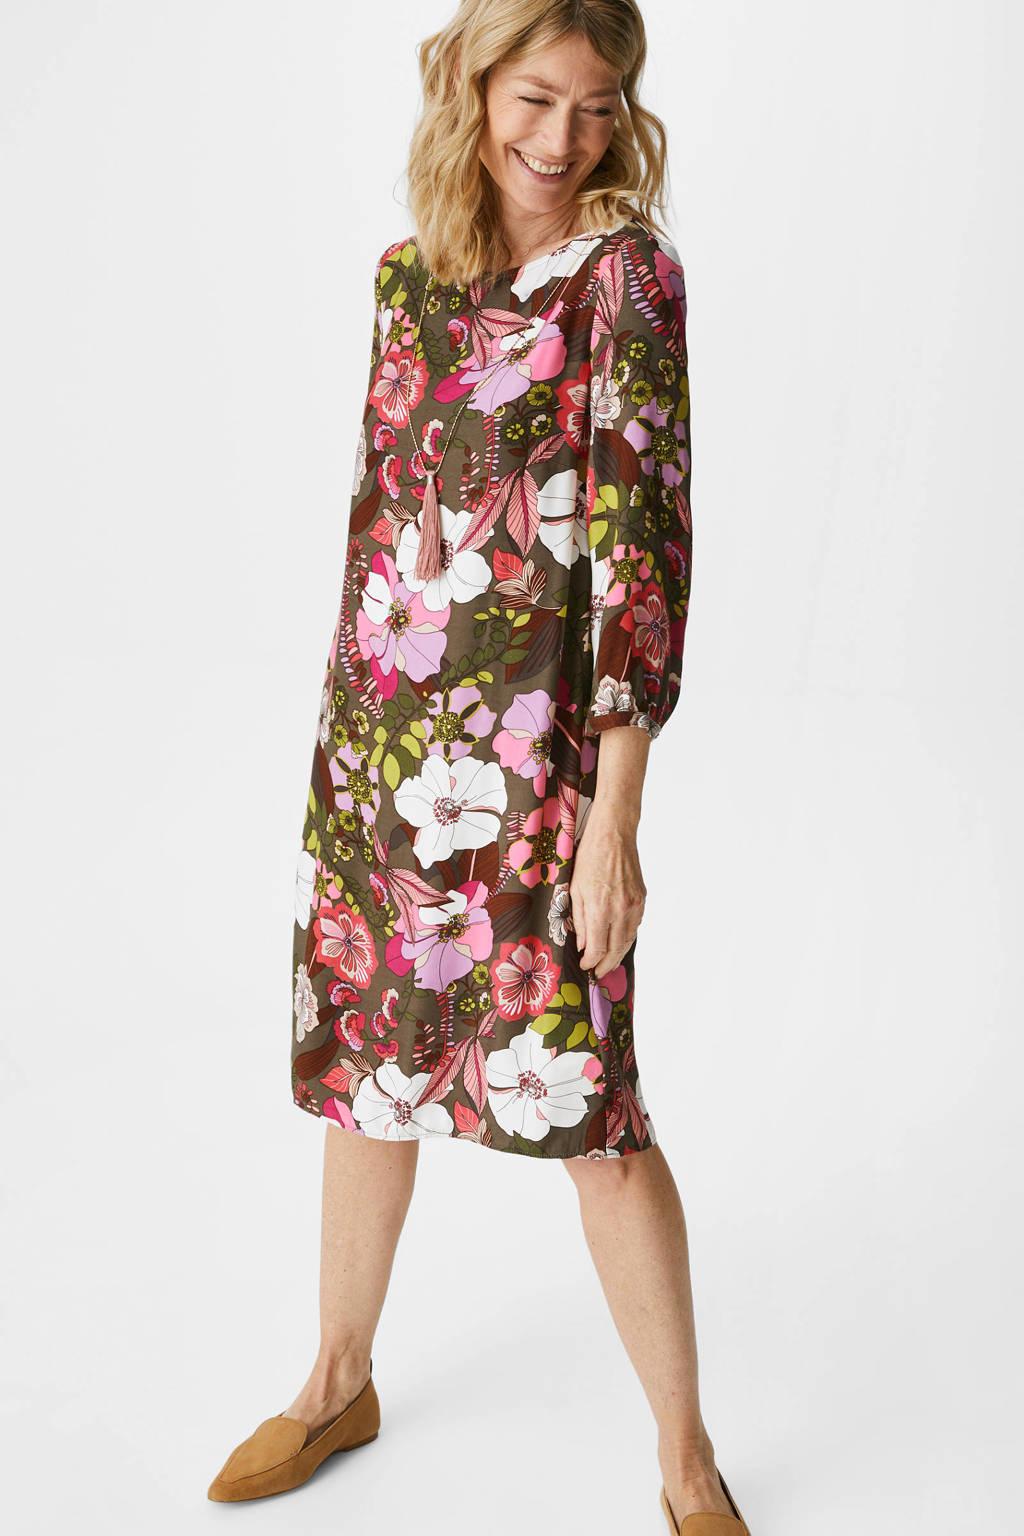 C&A Canda Premium gebloemde jurk kaki/roze